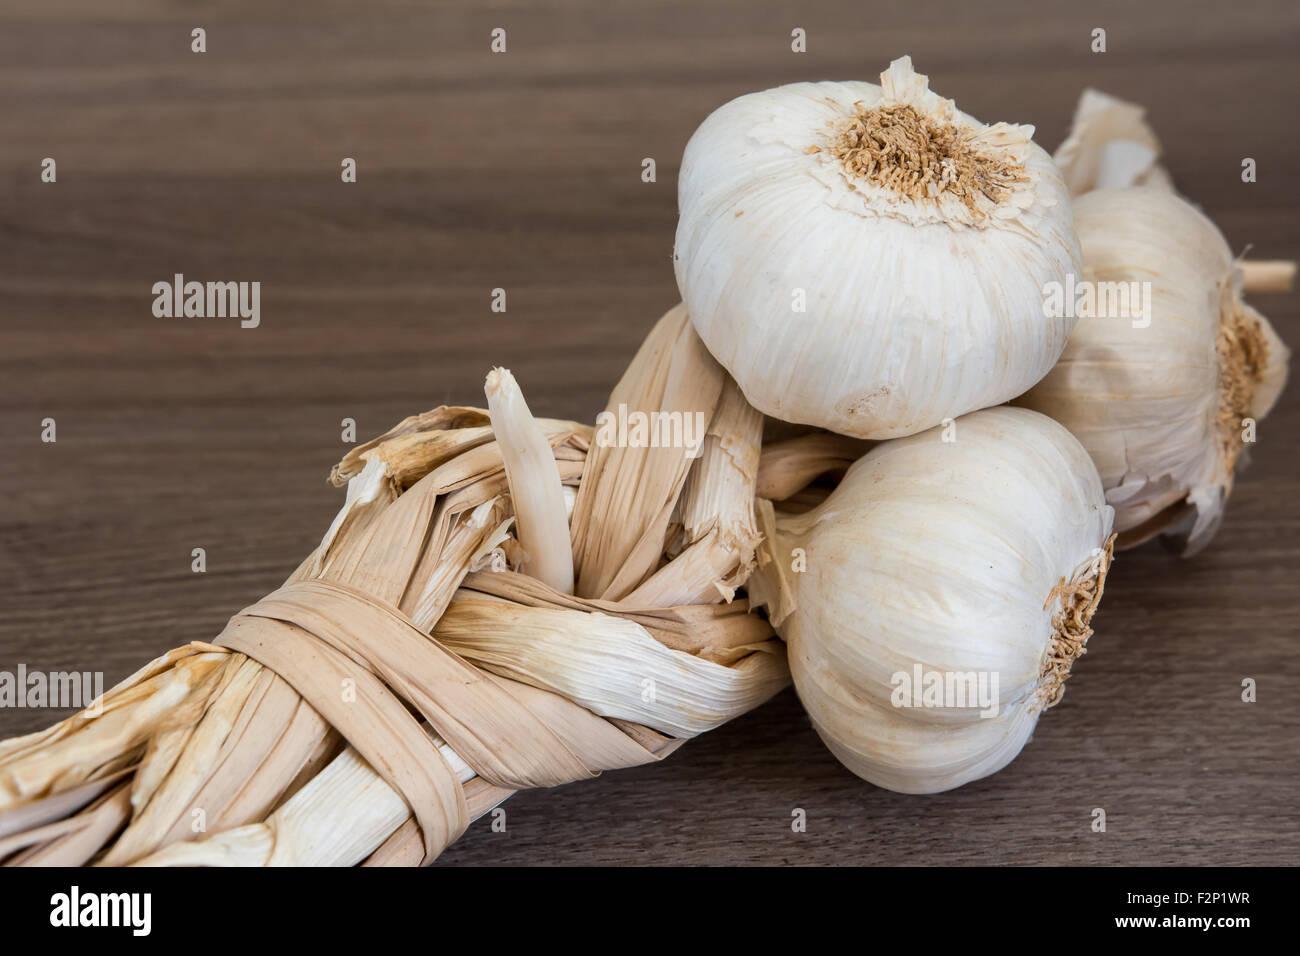 Organic garlic braid - Stock Image